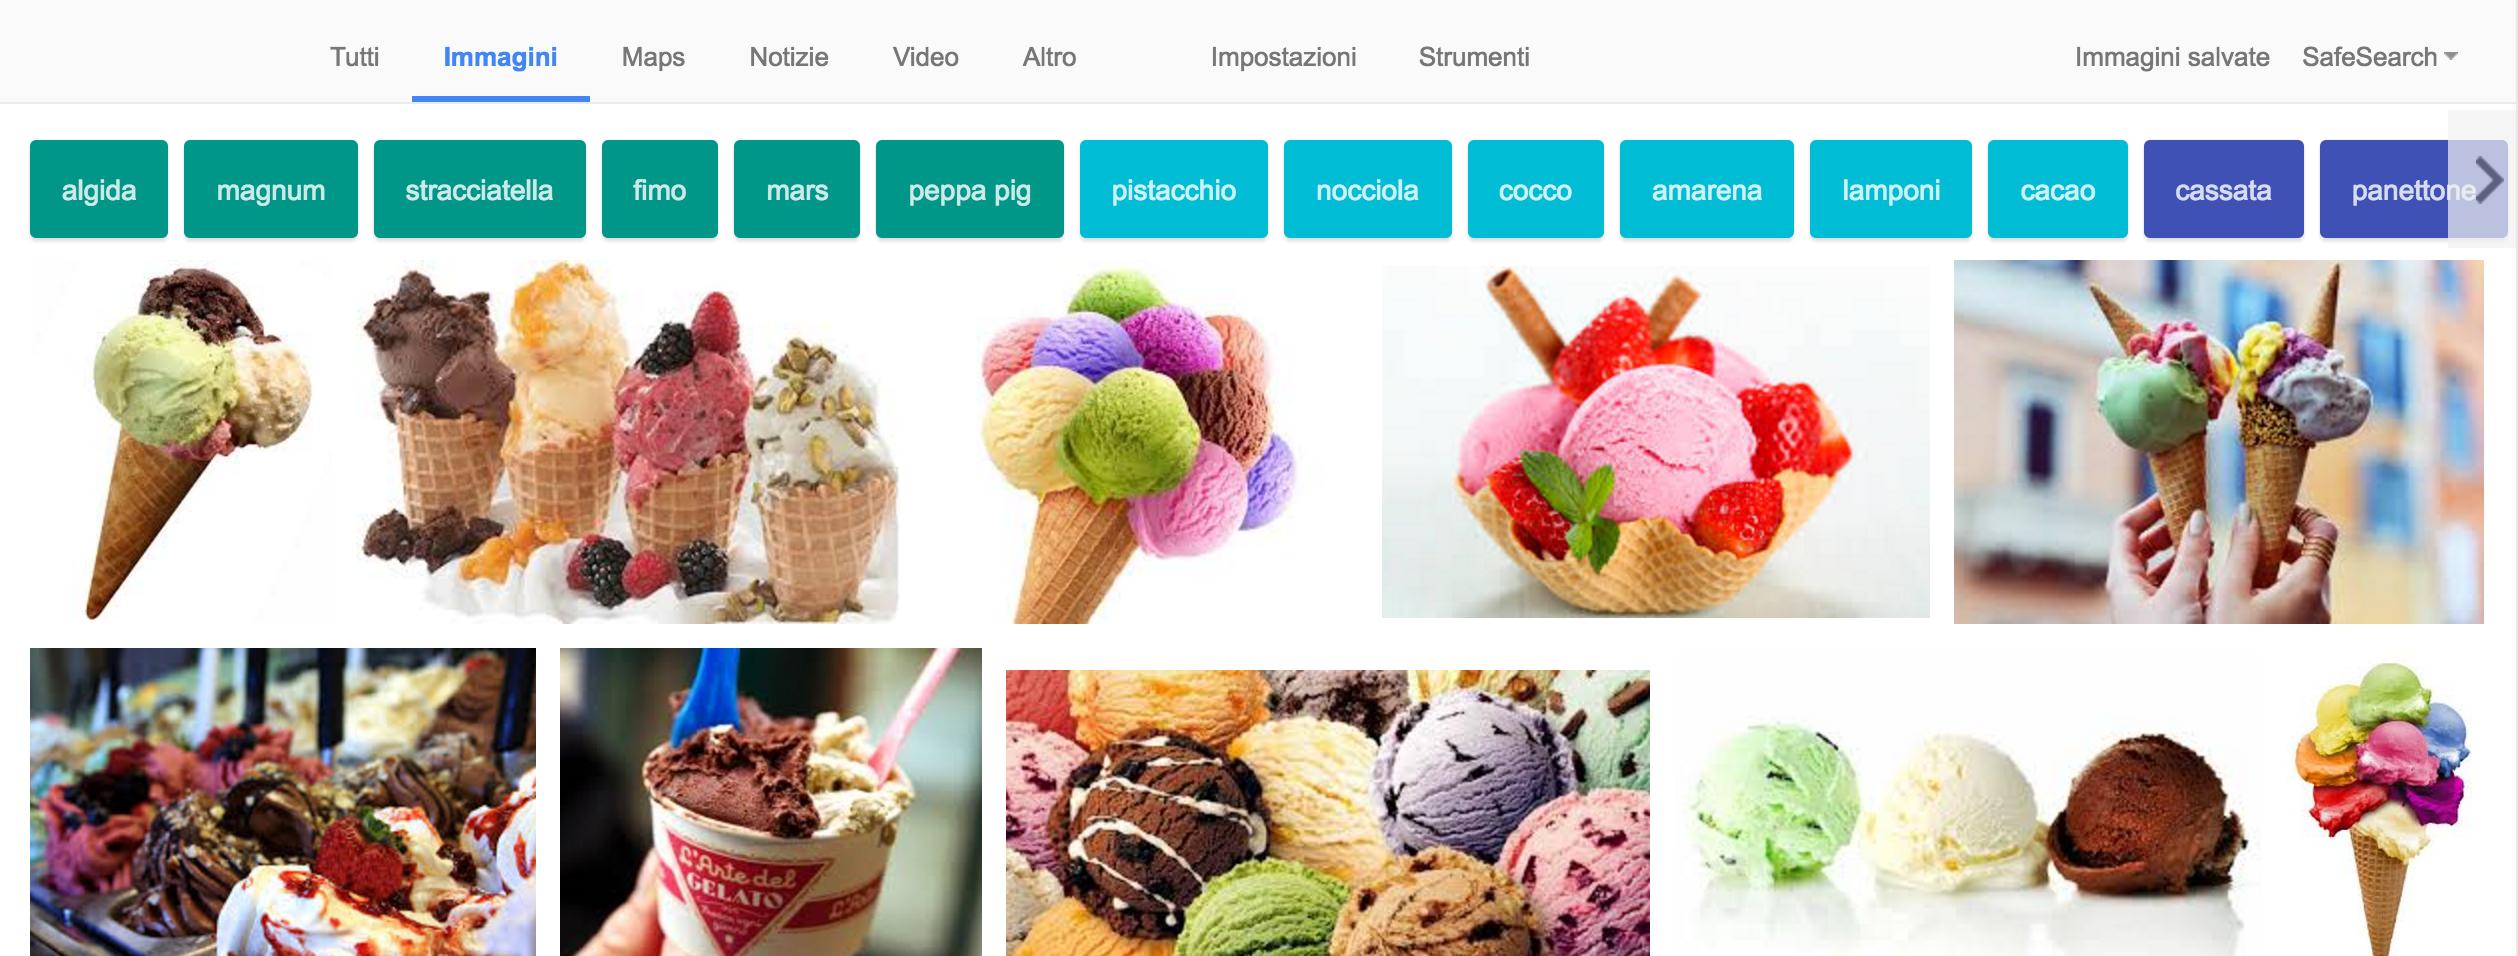 filtri ricerca google